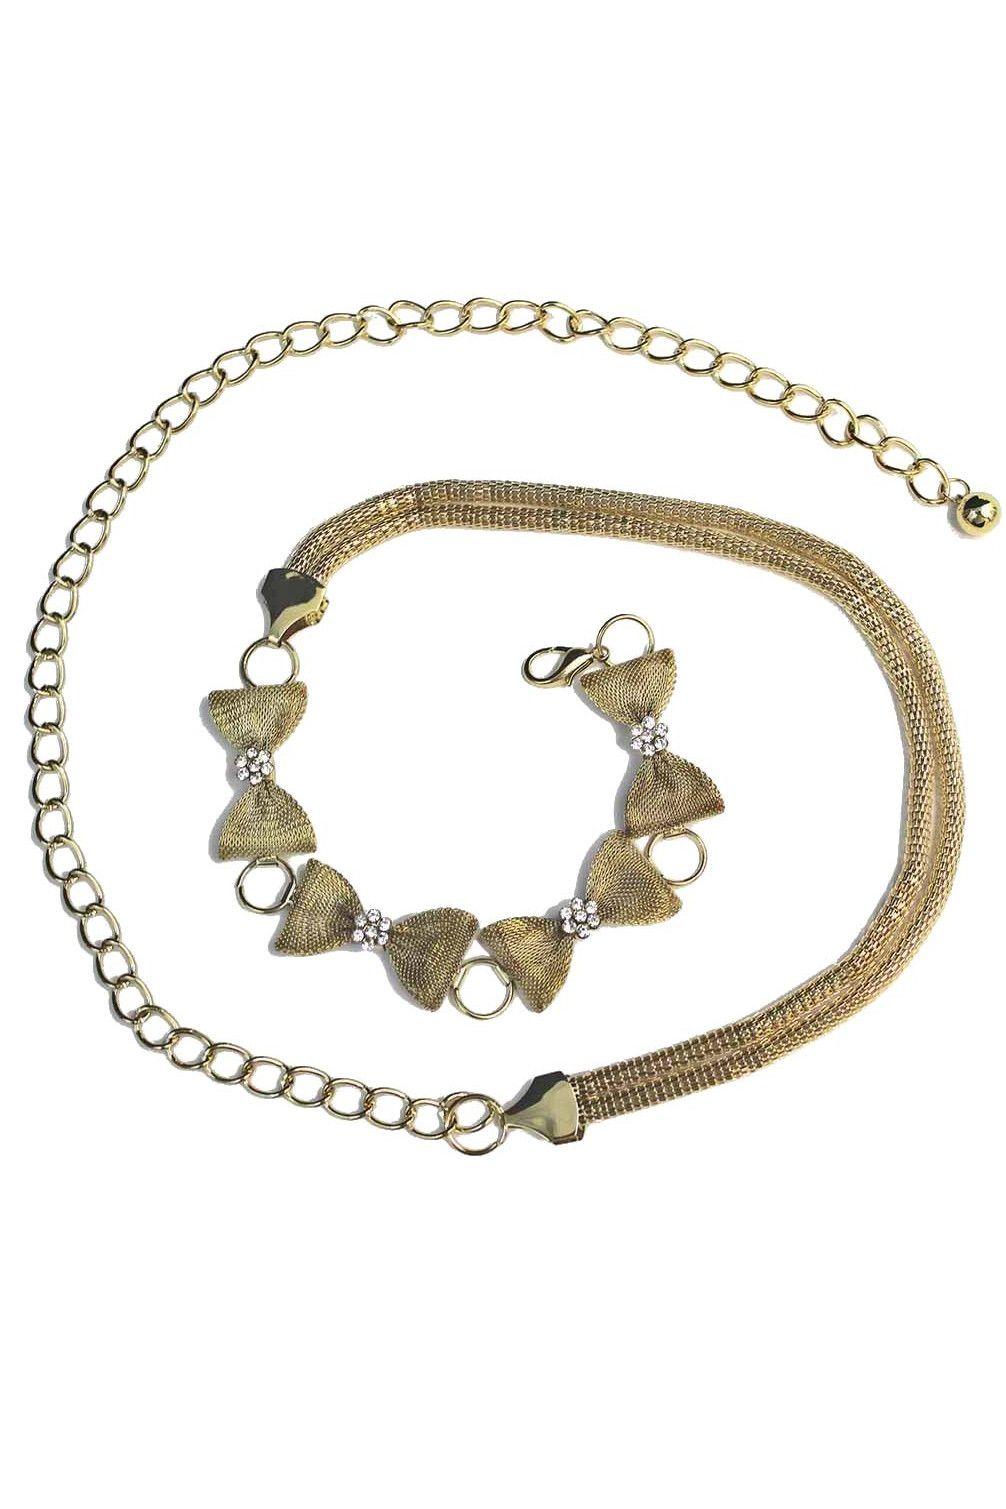 Rhinestone Crystal Rectangle Pattern Silver-tone Belly Chain Belt